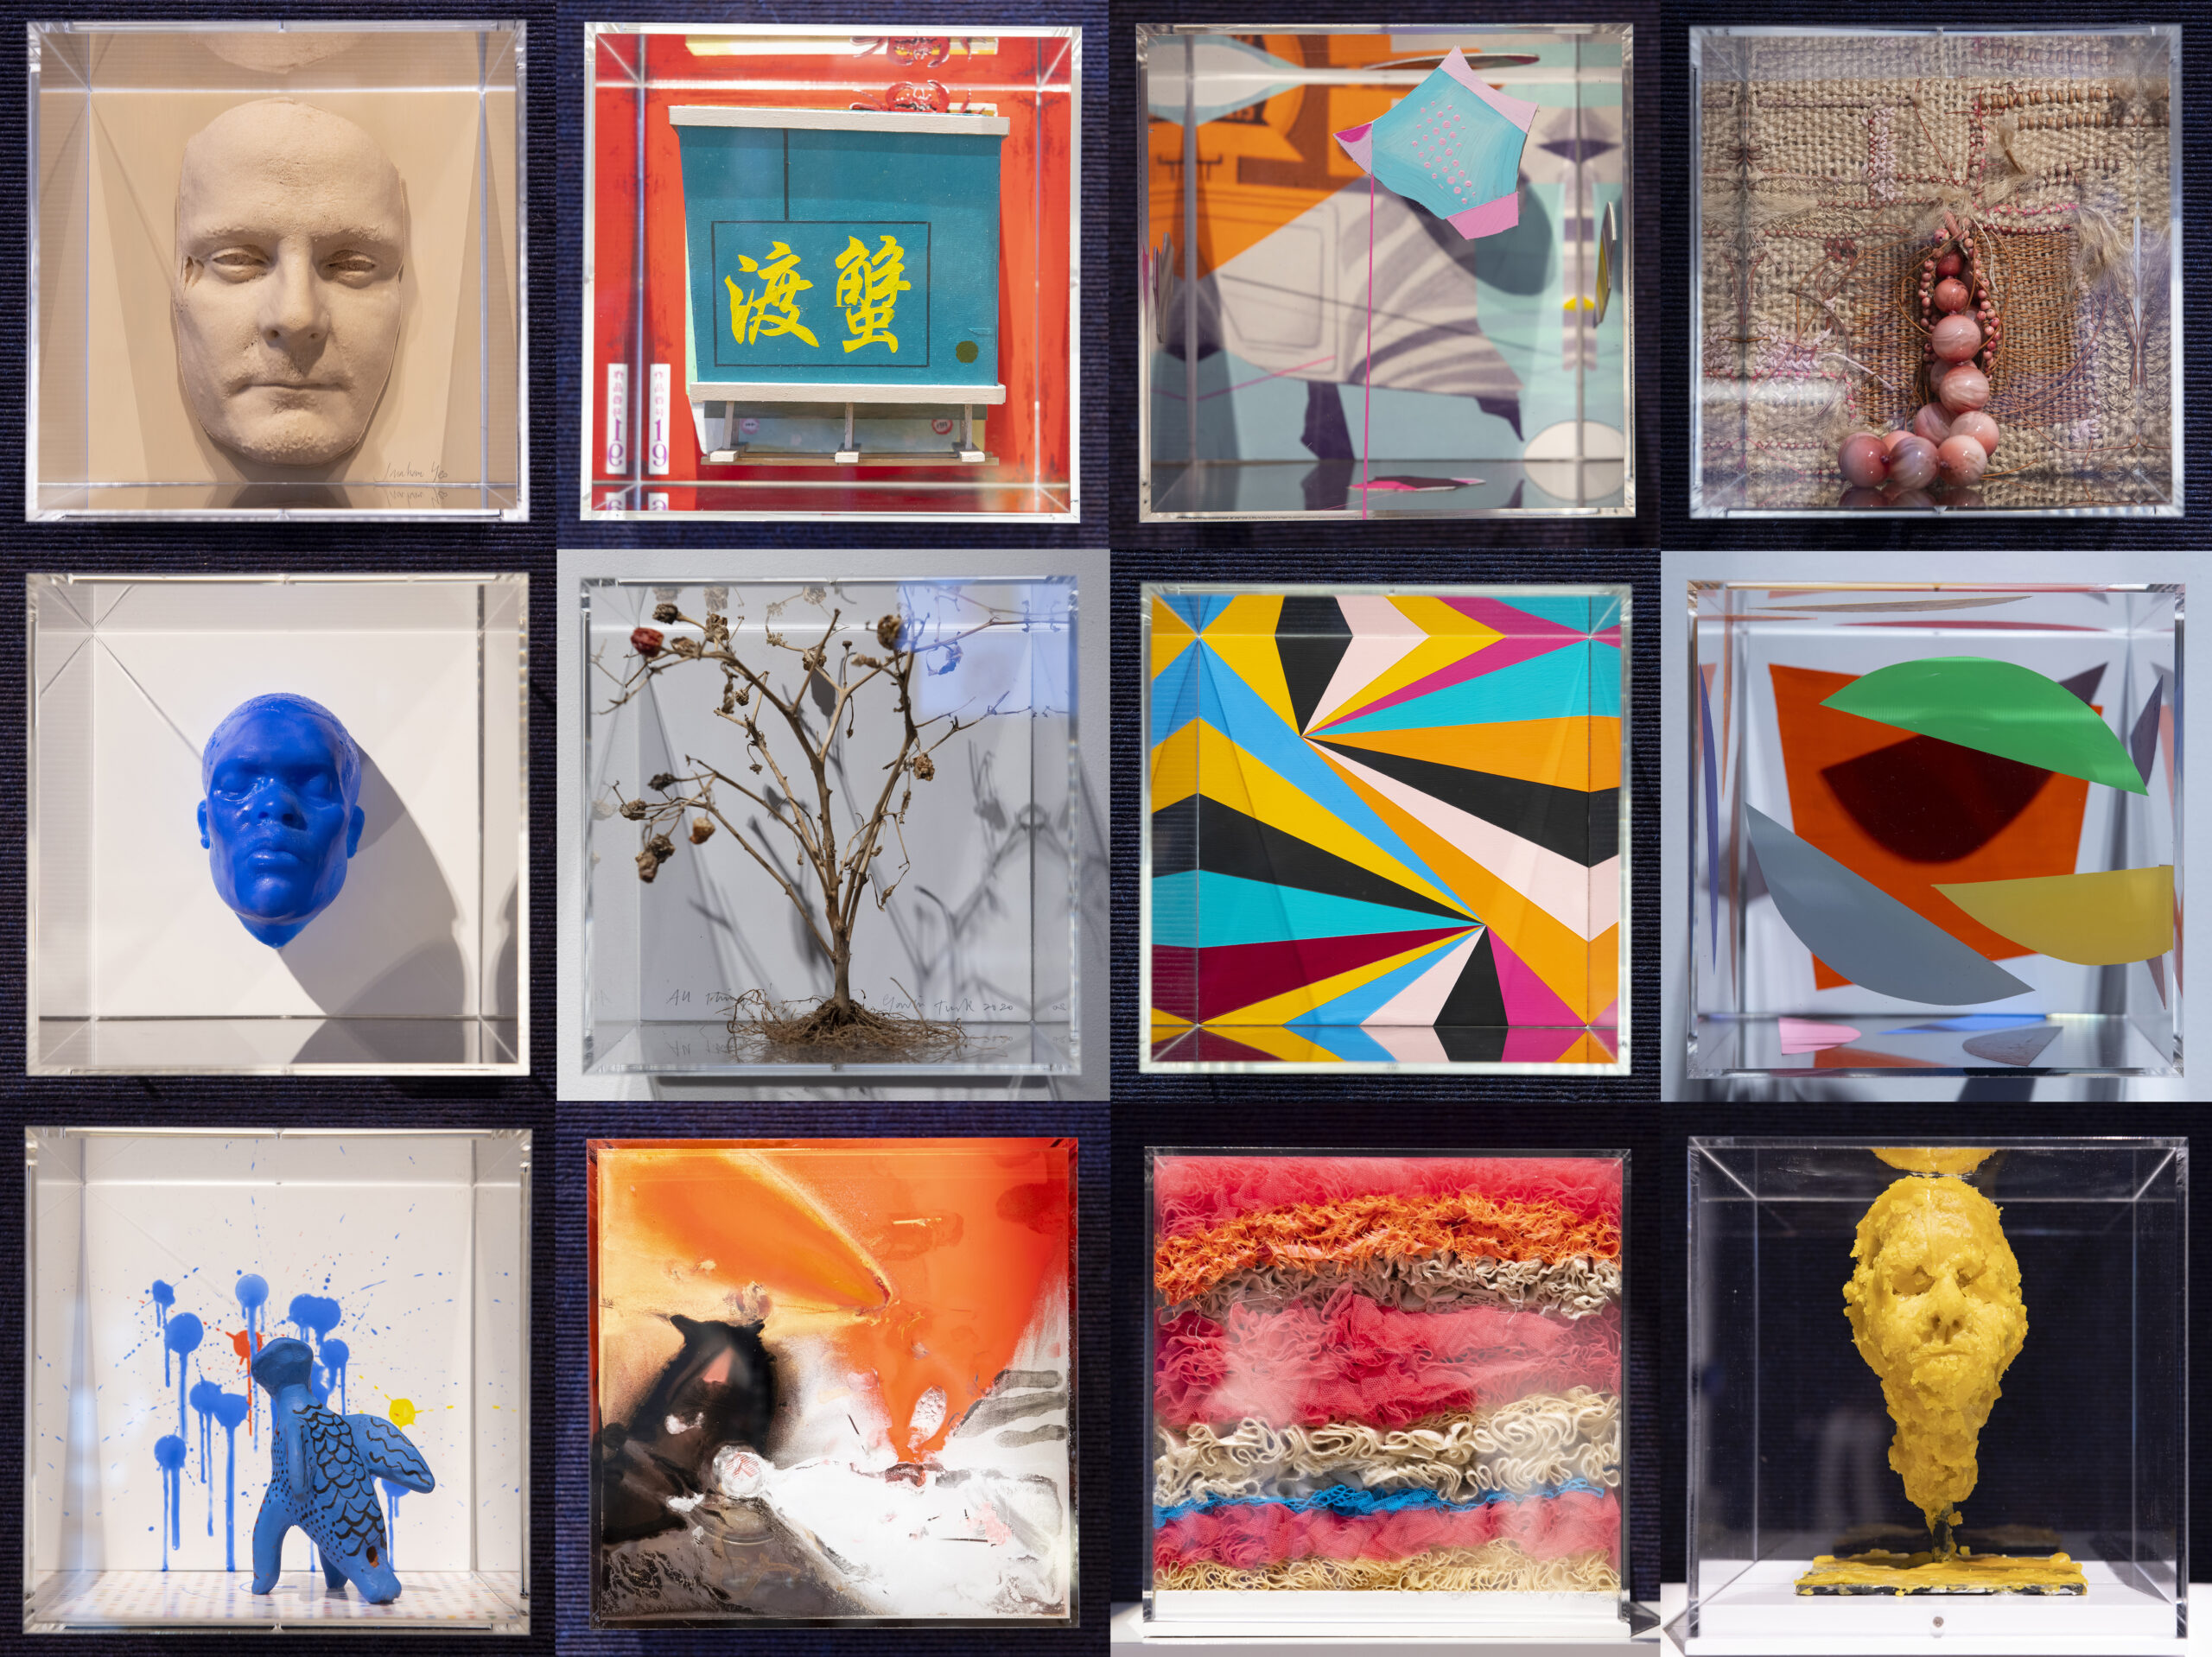 cure³-exhibition-malcolm-parks-artworks-montage